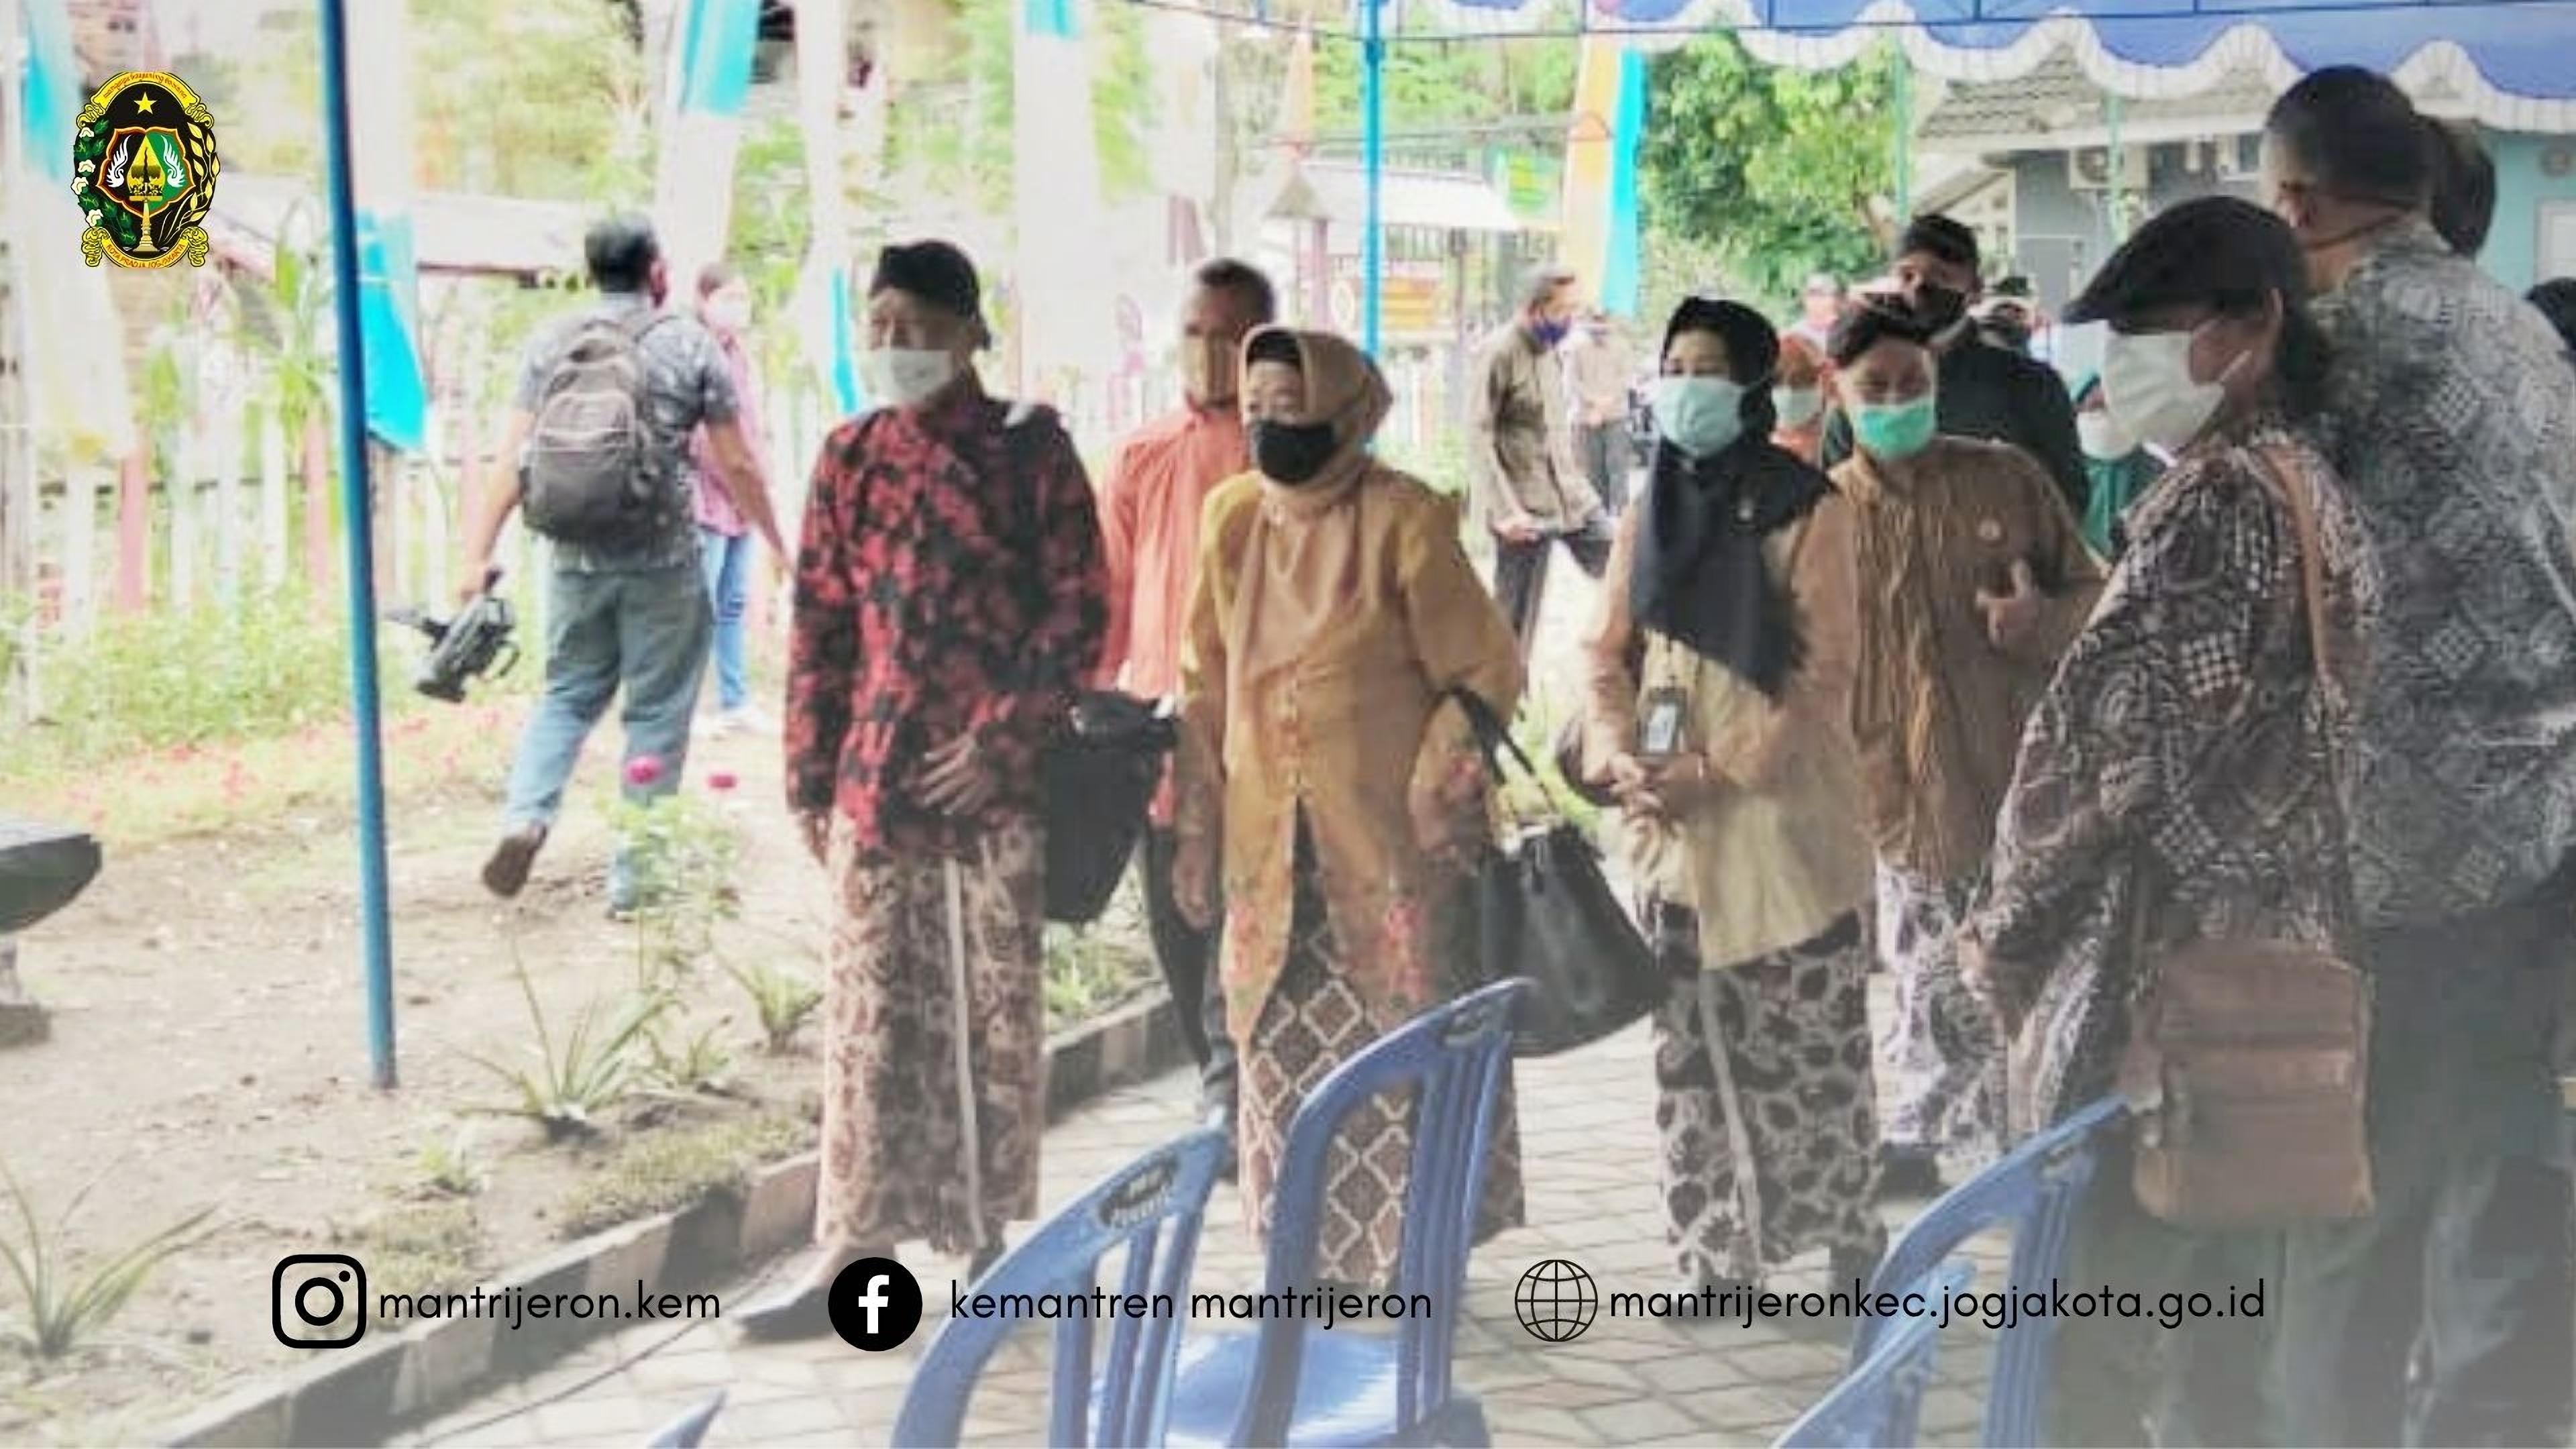 Kelomtan Ngudi Mulyo Suryodiningratan Mewakili Kota Yogyakarta dalam Lomba Lumbung Mataraman 2021